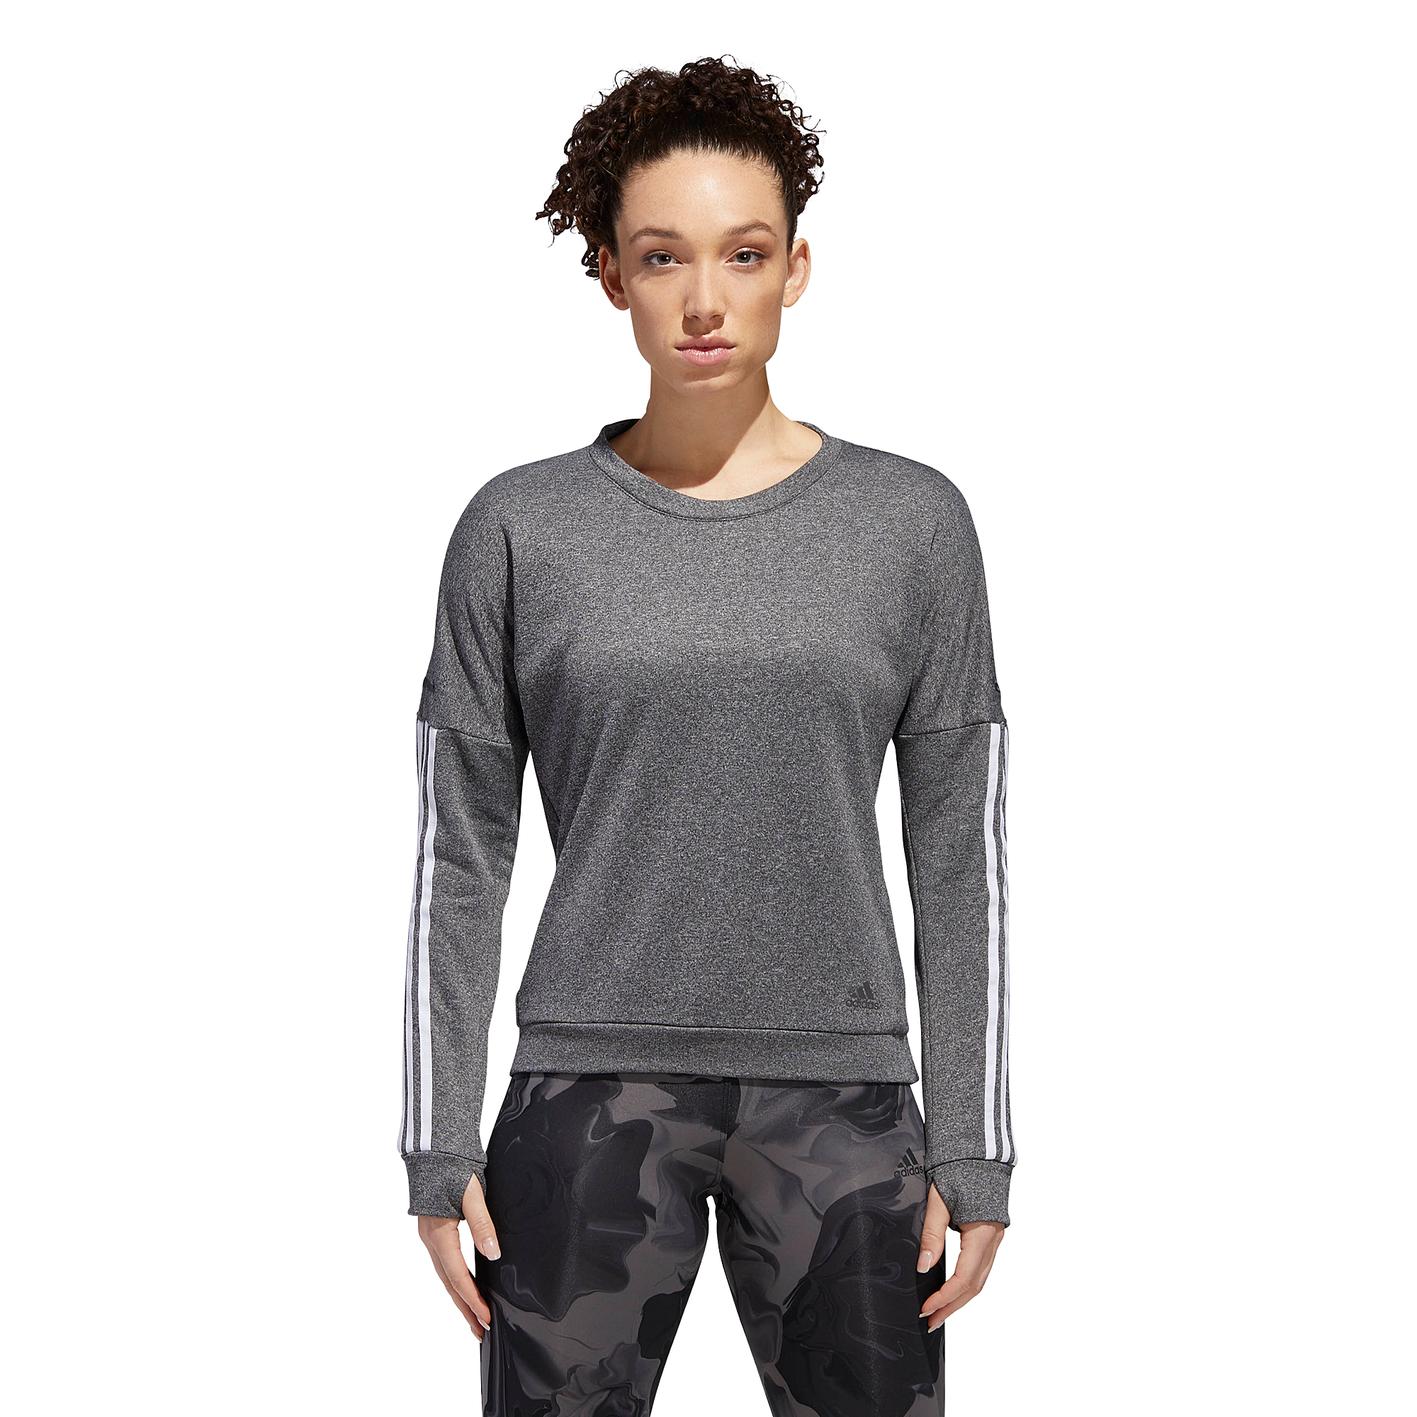 244e2058c0e adidas 3 Stripe L/S Tee - Women's - Running - Clothing - Dark Grey ...